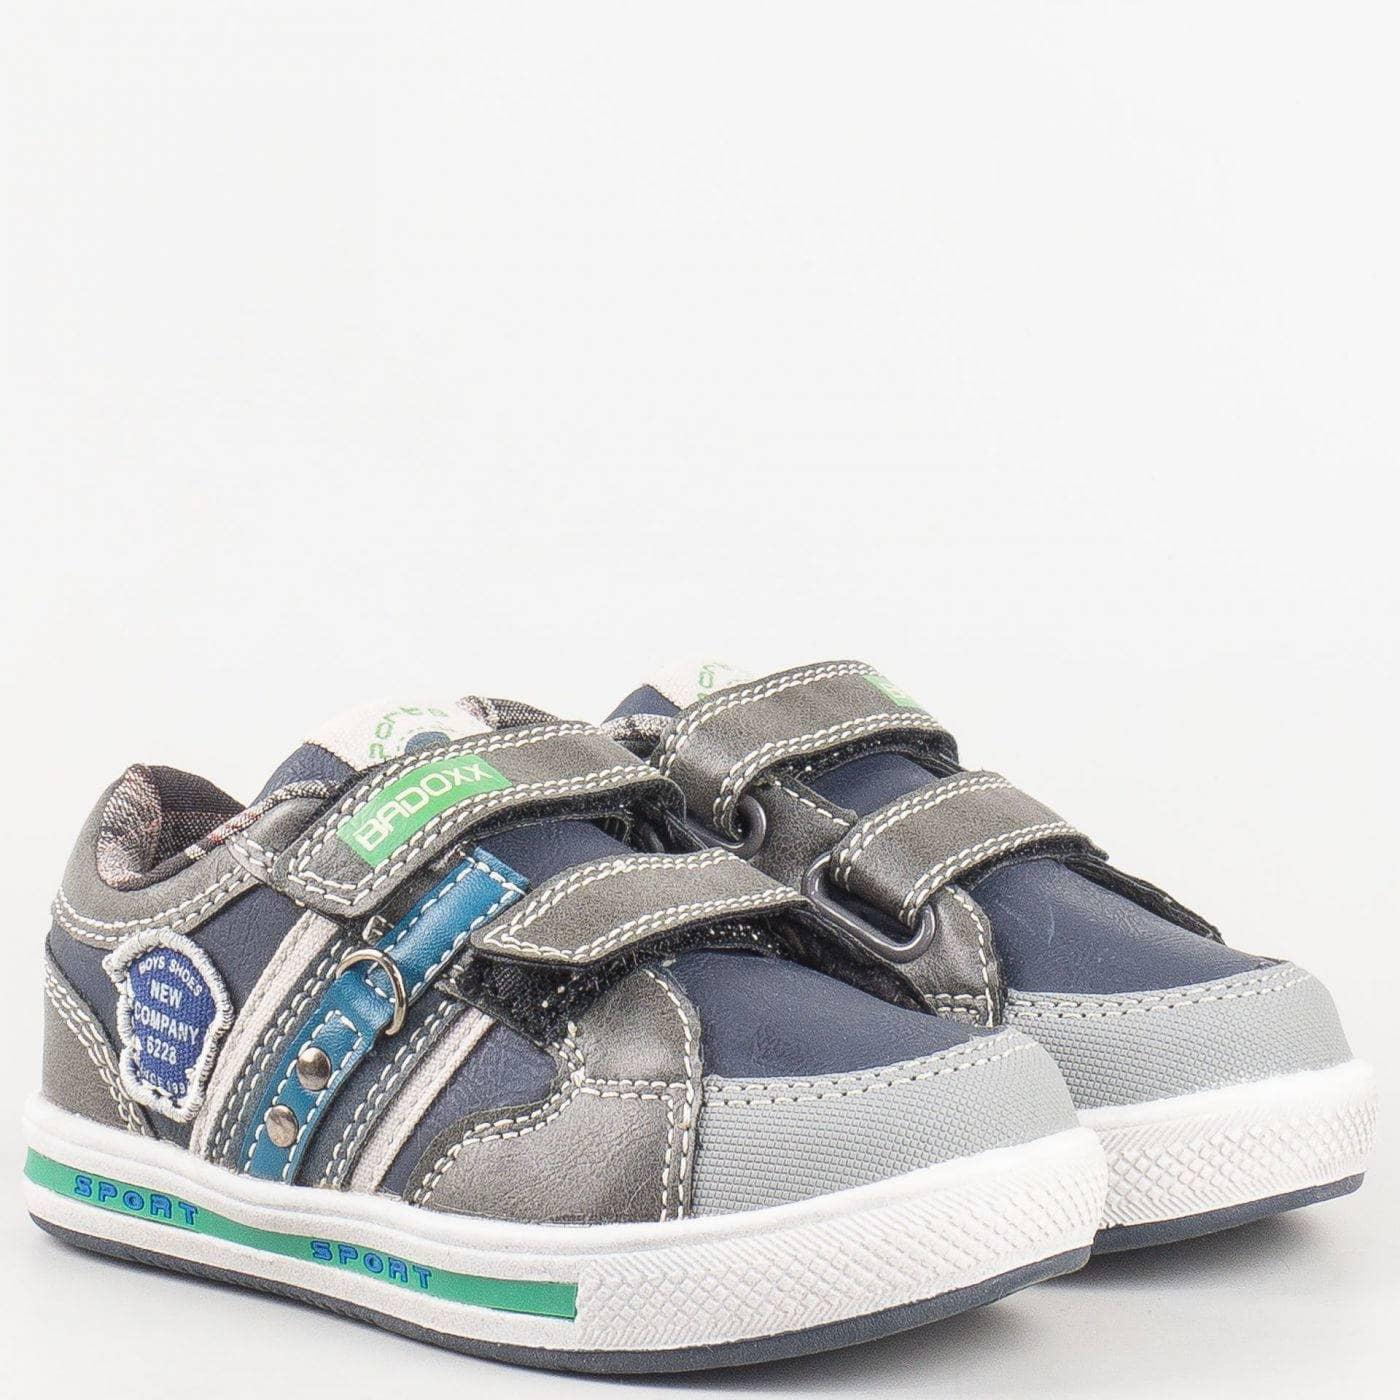 ca9e14139ca Детски български спортни обувки с две велкро лепенки в сиво и синьо 6274s -  Sisi-bg.com